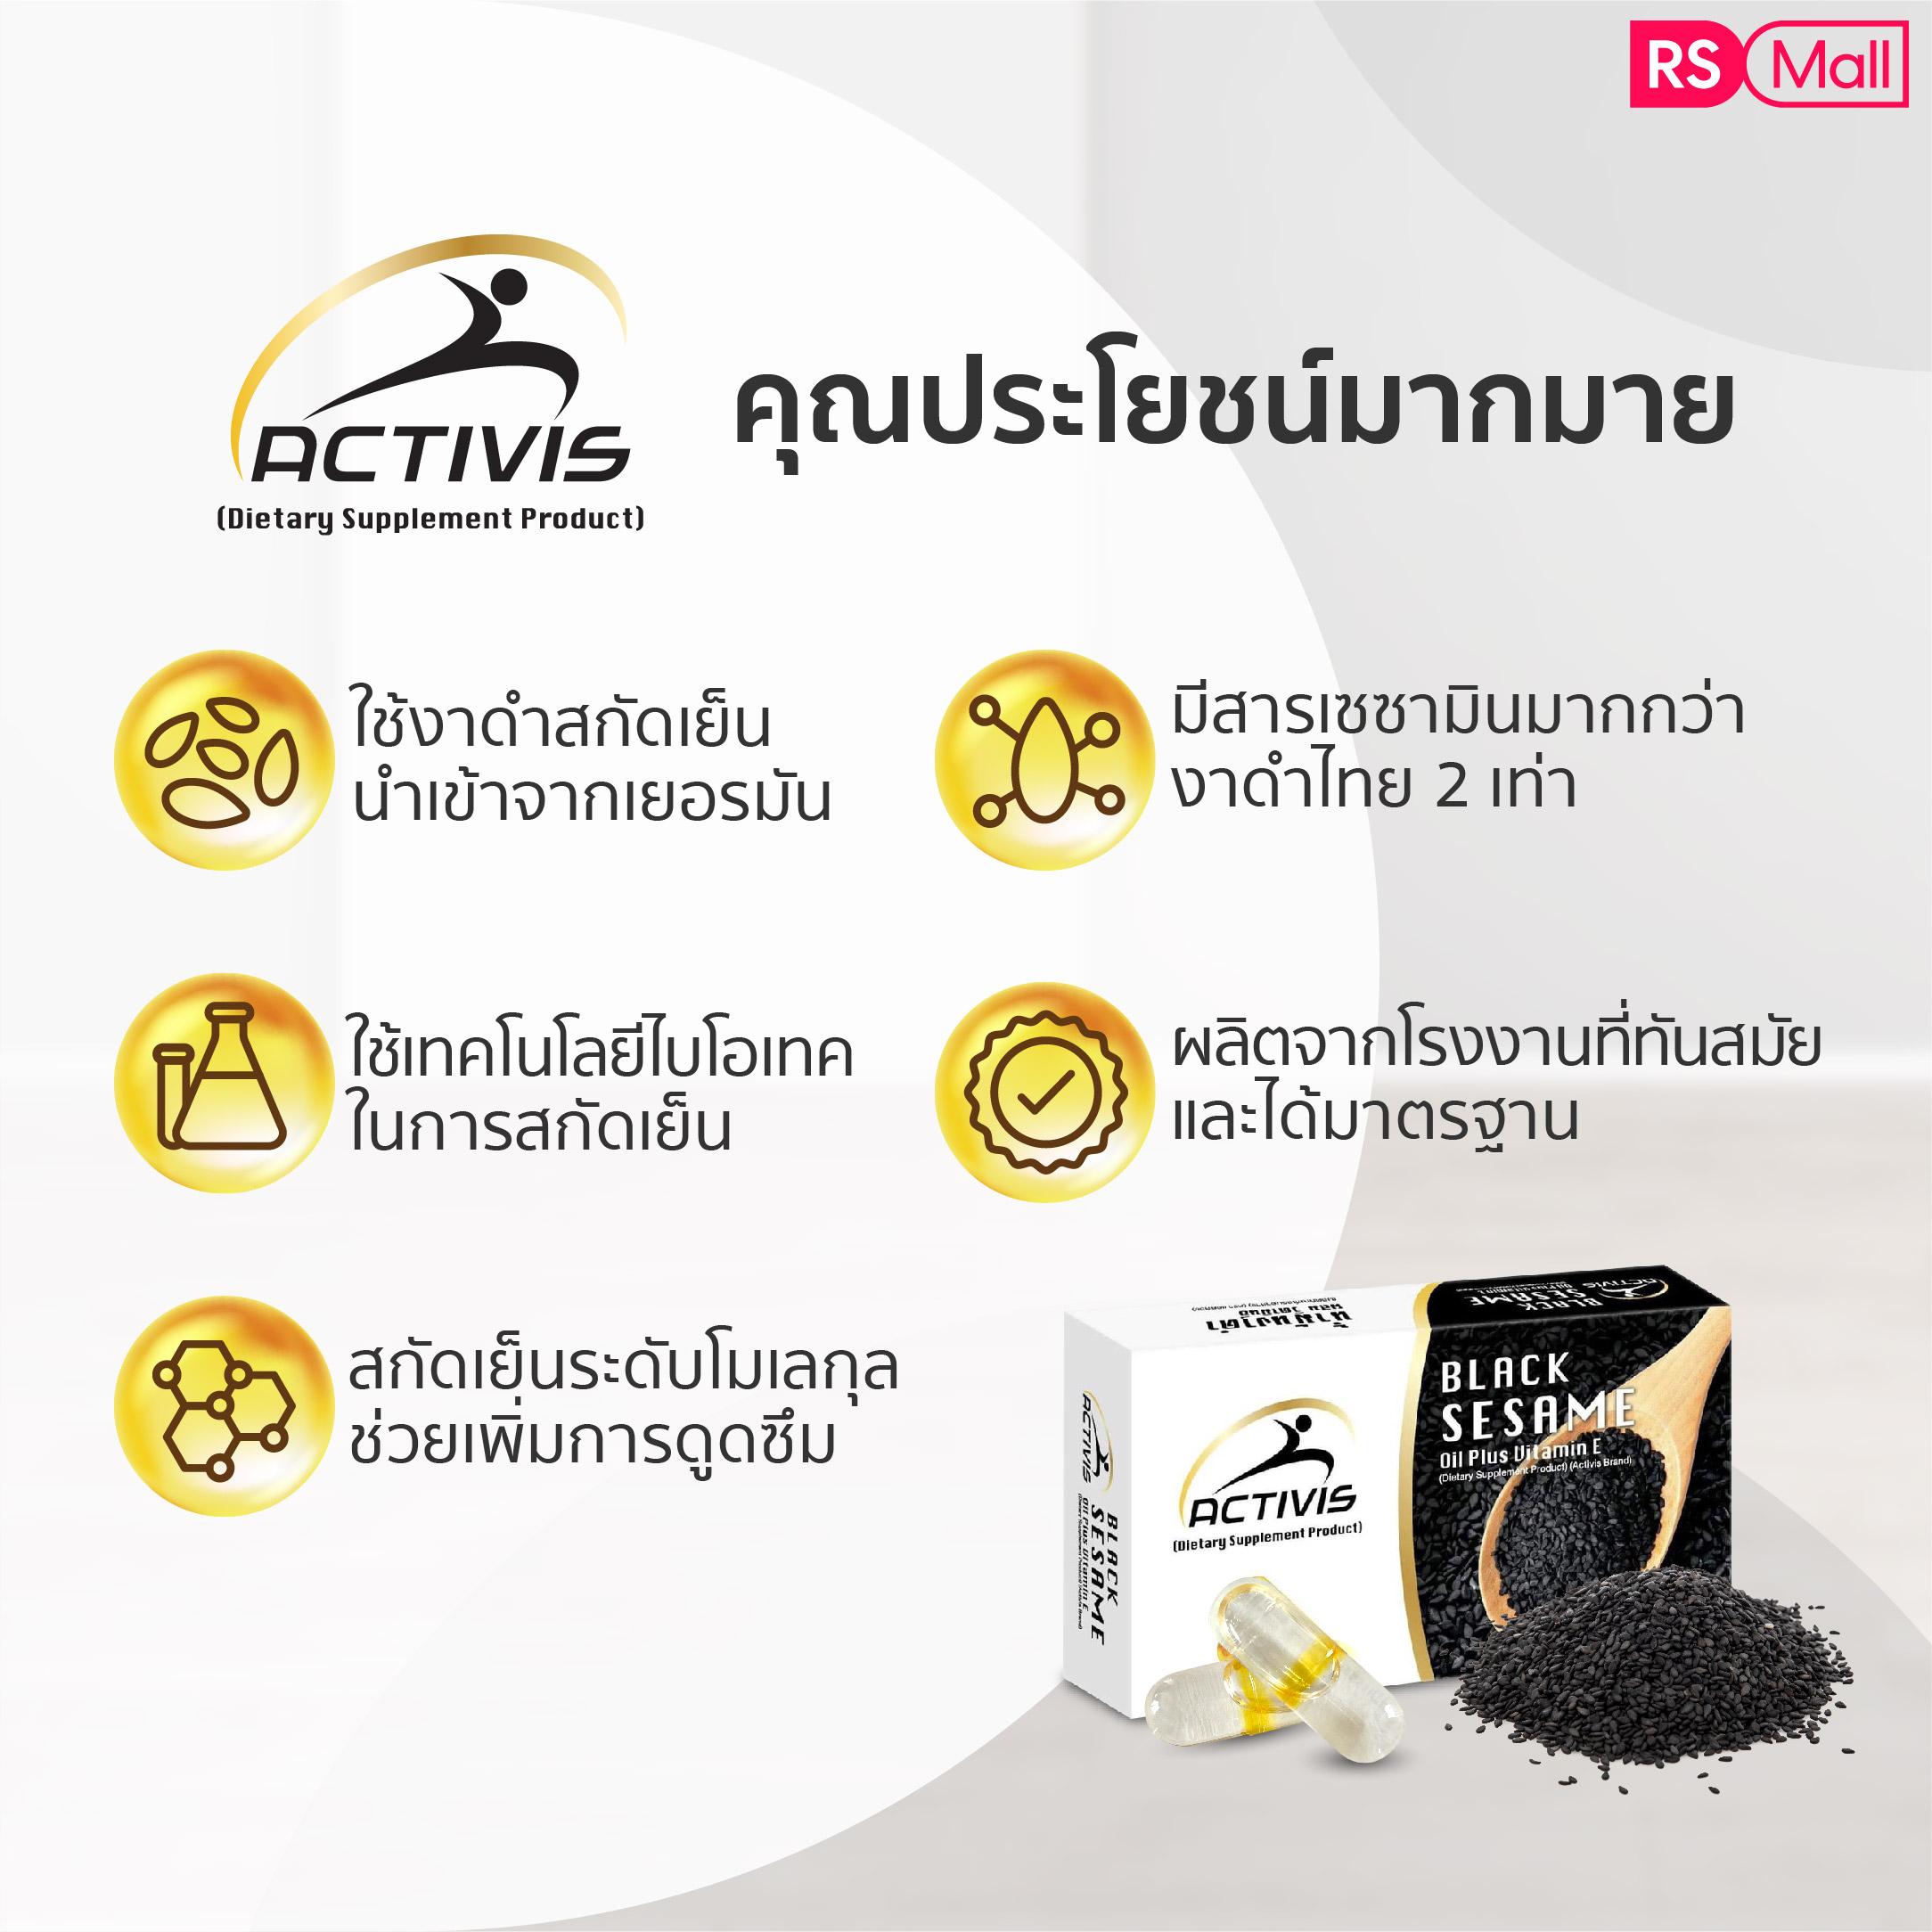 ACTIVIS น้ำมันงาดำ ผสมวิตามินอี (Black Sesame Oil plus Vitamin E)